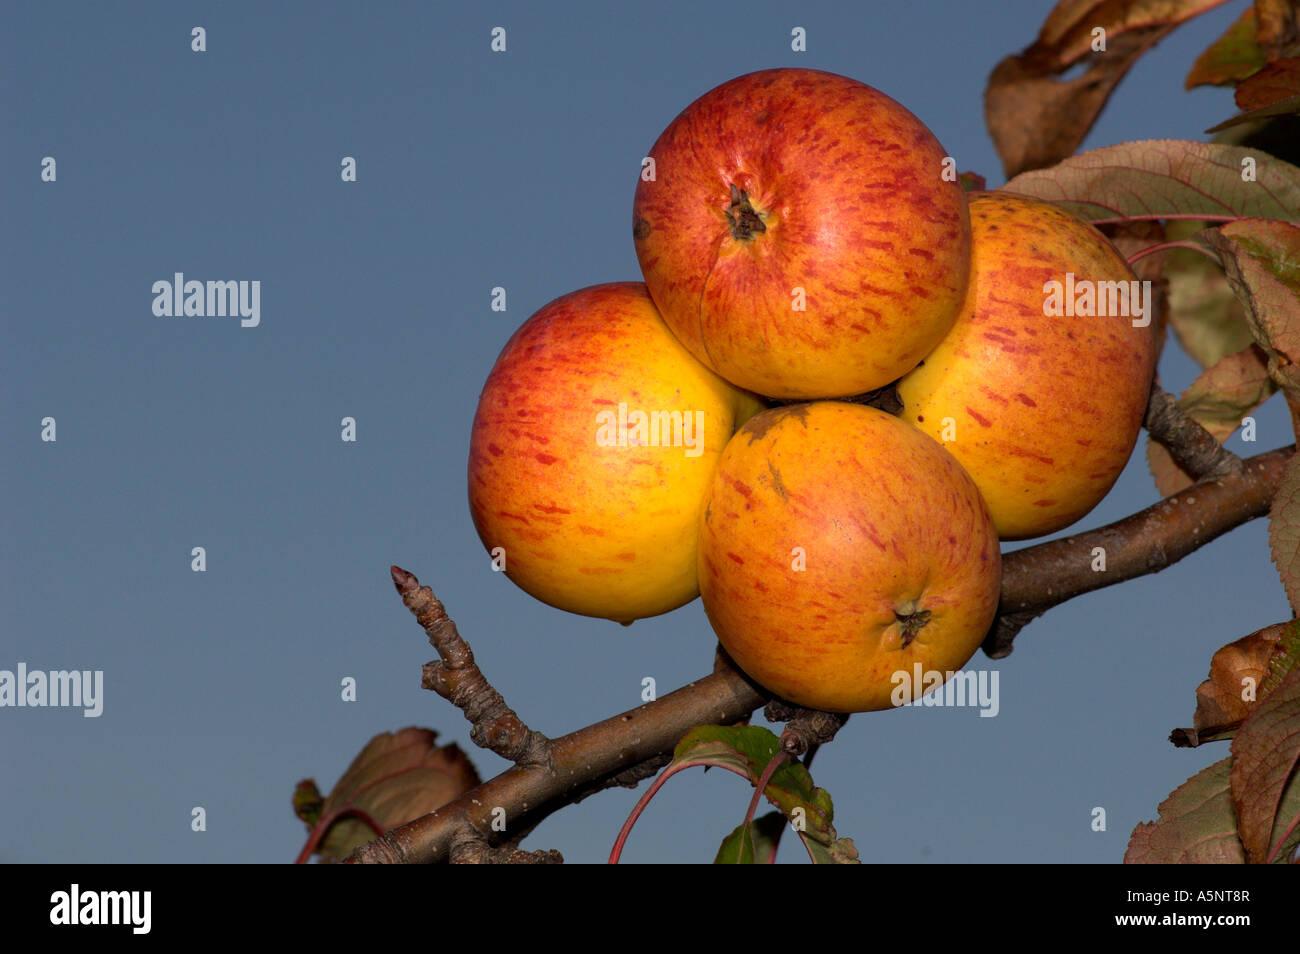 Bühler Gartenbau bühler stockfotos bühler bilder alamy